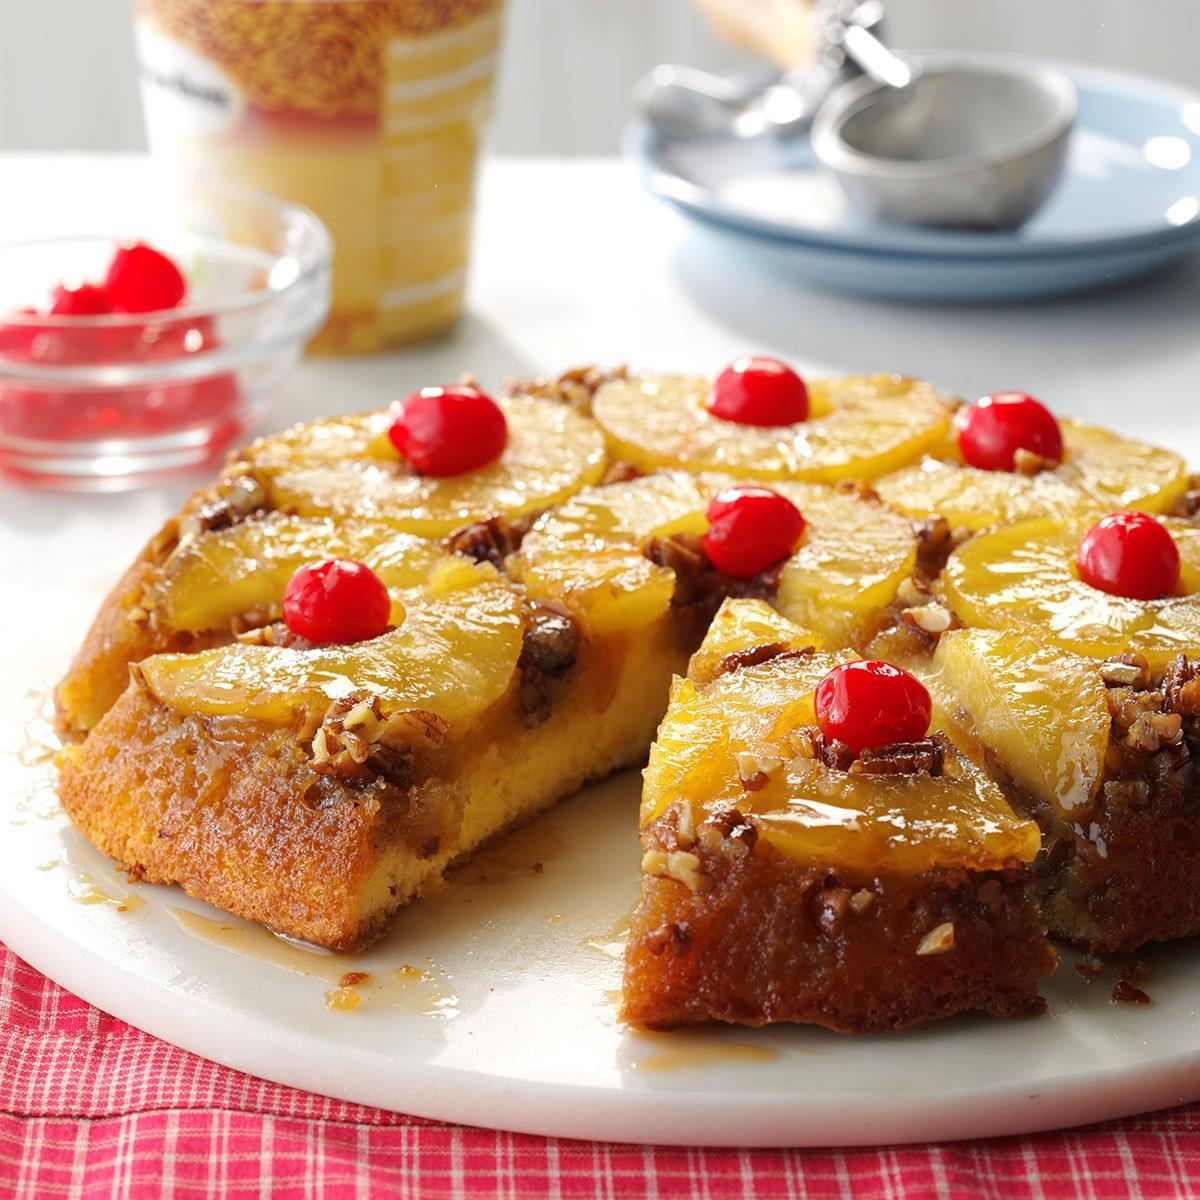 Skillet Pineapple Upside Down Cake  Skillet Pineapple Upside Down Cake Recipe